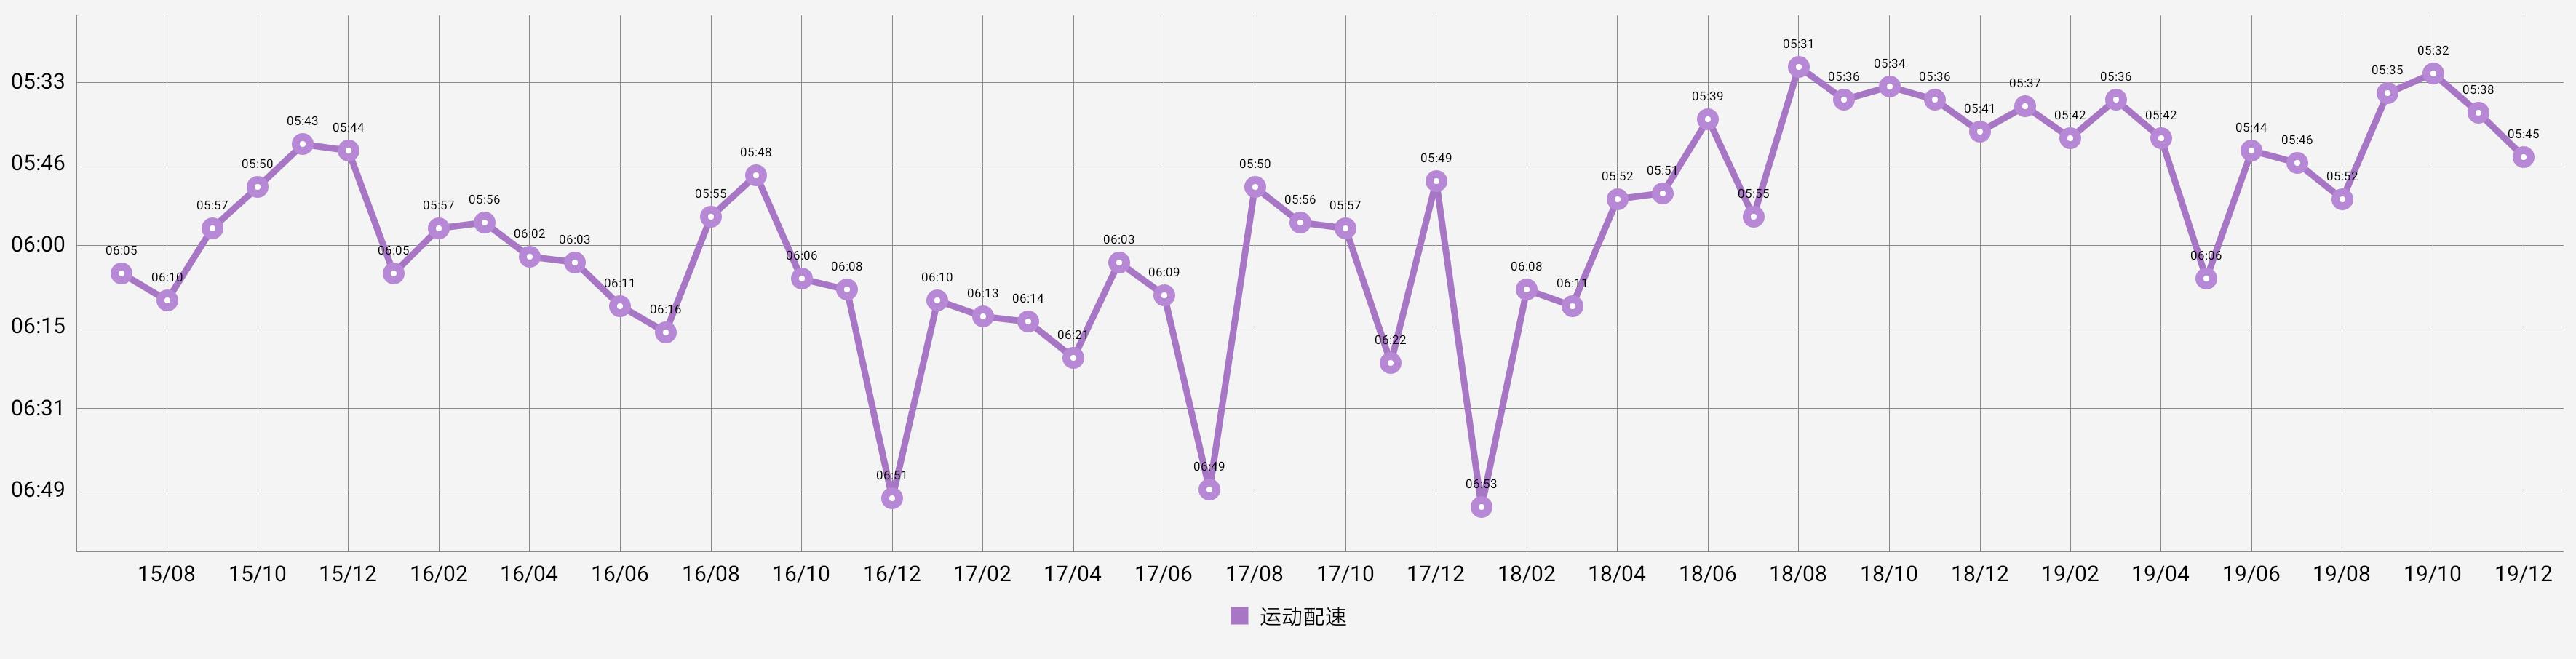 2015-2019年度跑步配速